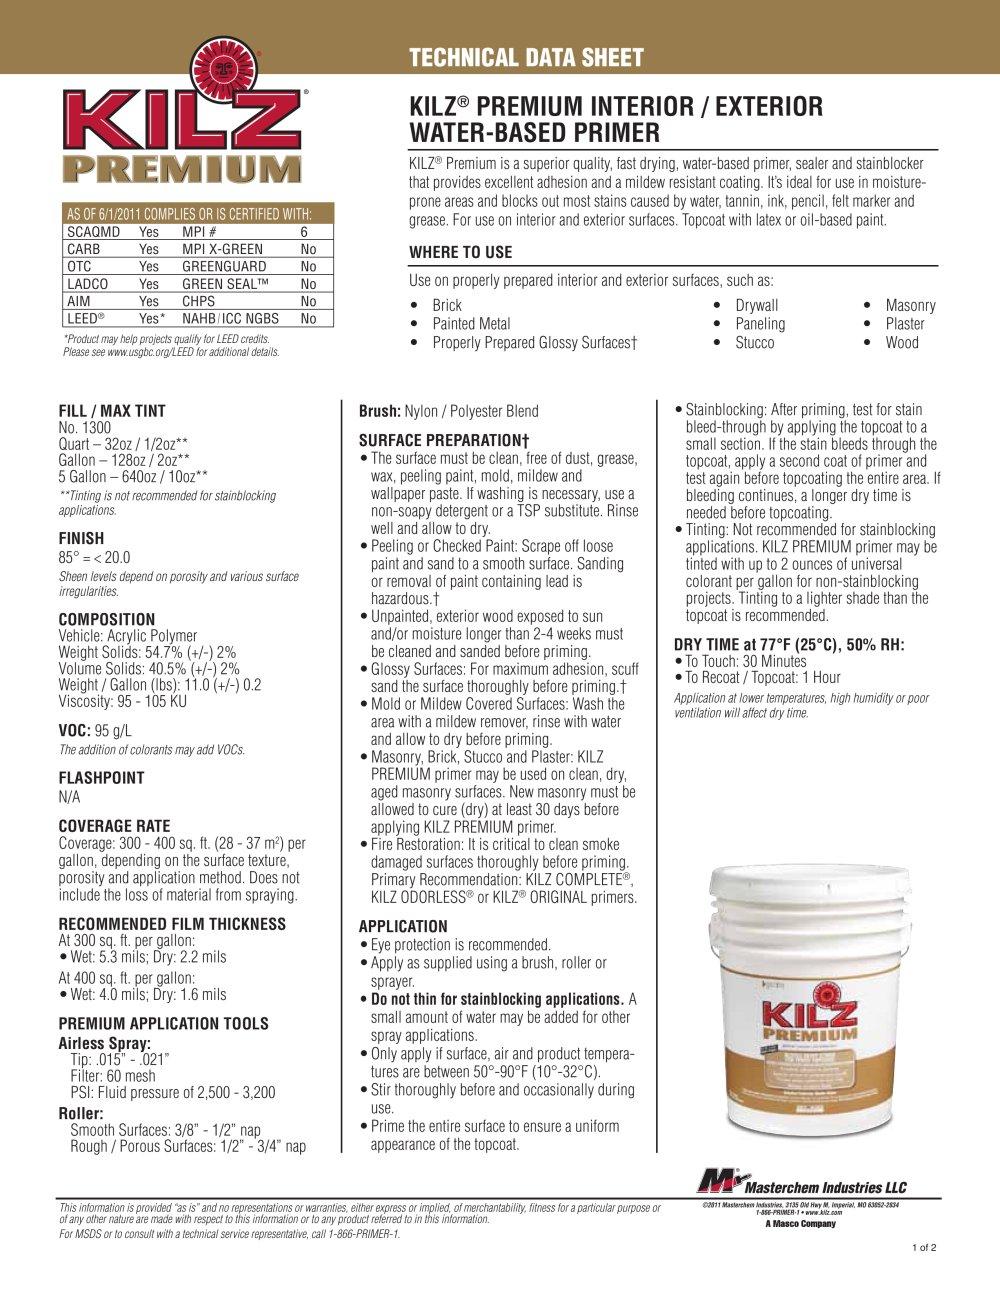 Lovely KILZ® PREMIUM INTERIOR / EXTERIOR WATER BASED PRIMER   1 / 2 Pages